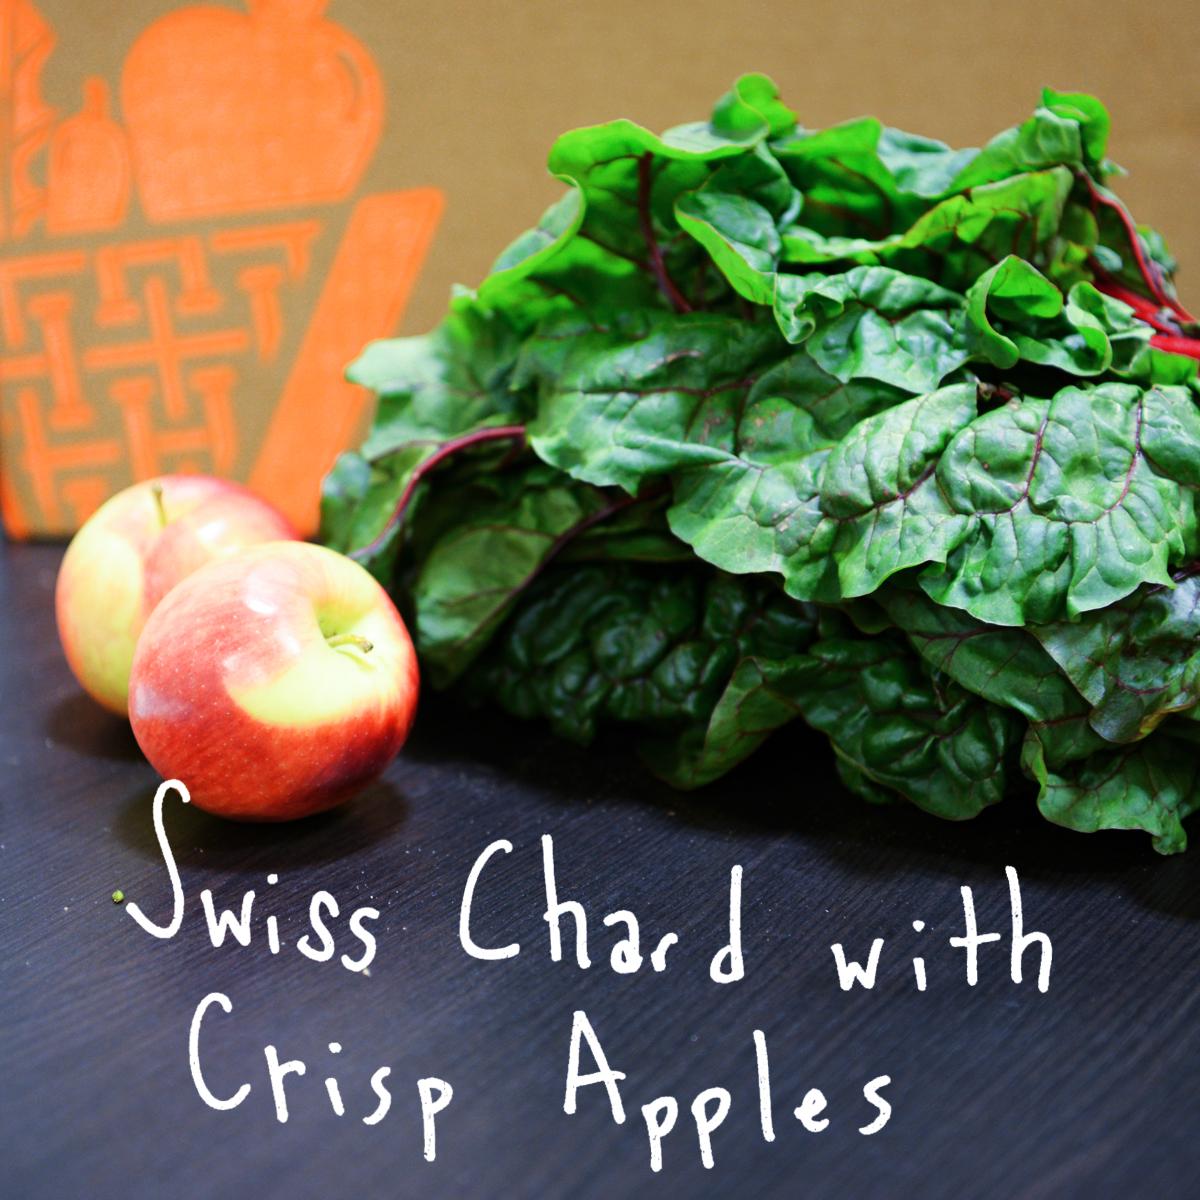 Apple & plumped raisins help sweeten the bitterness of Swiss chard. - Find the recipe at: Fat Free Vegan